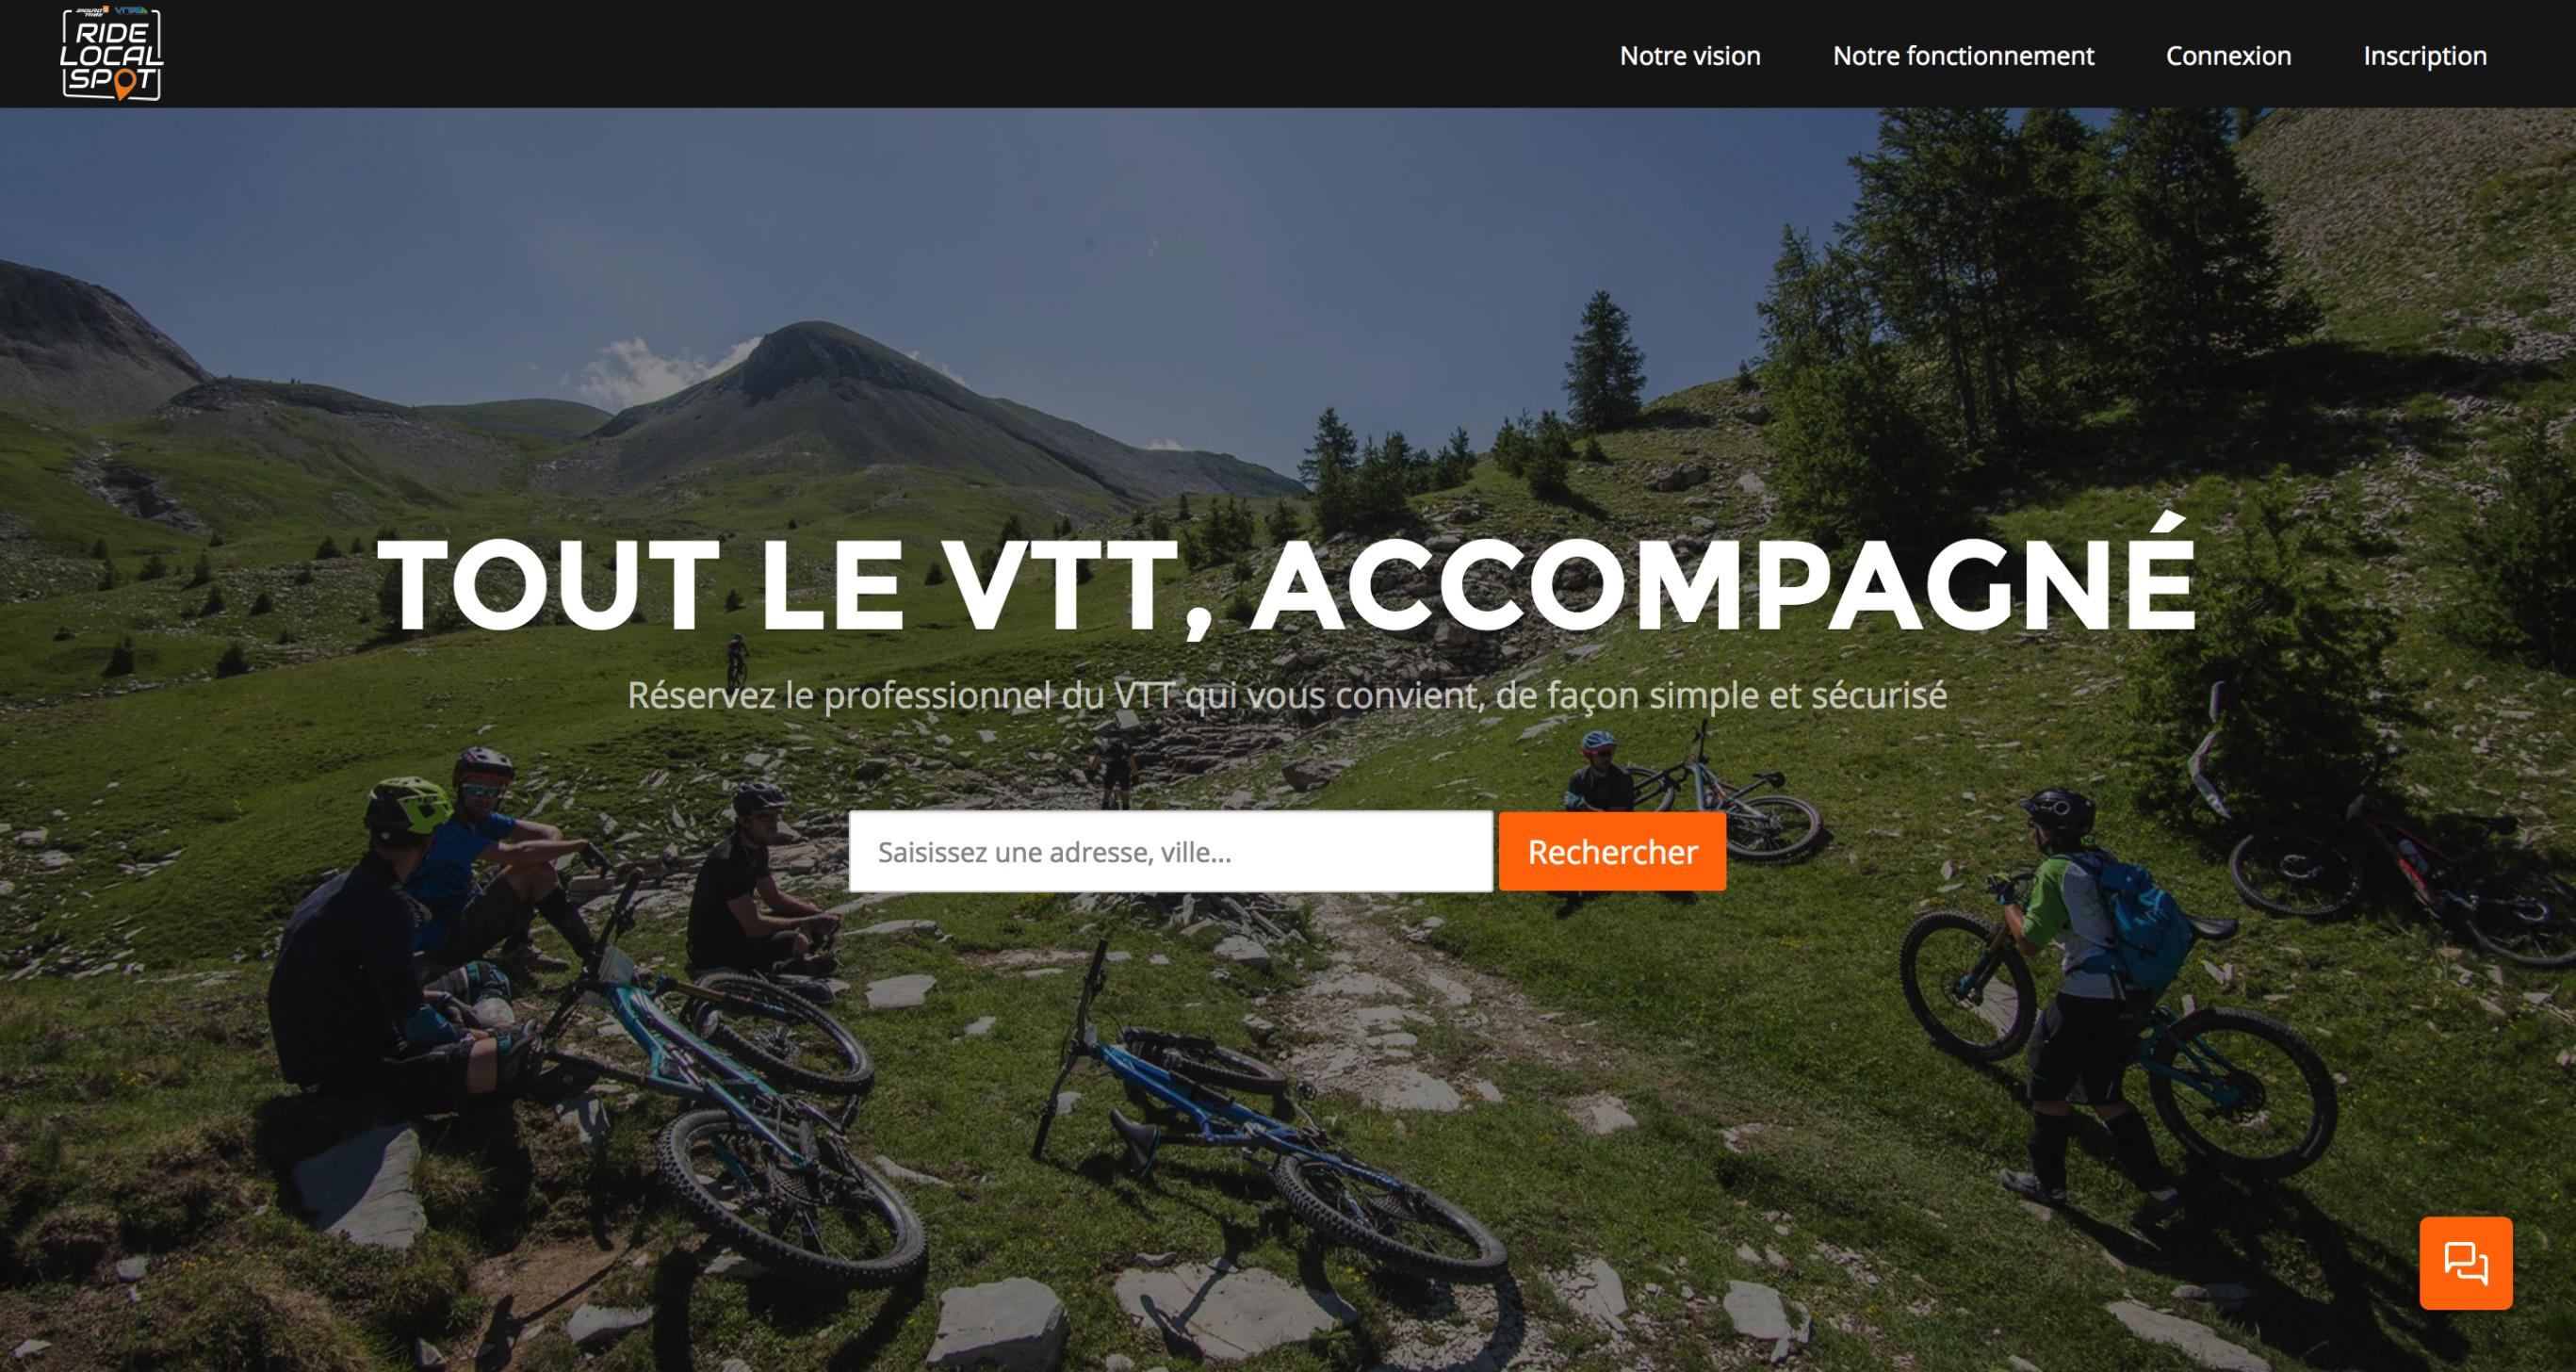 RideLocalSpot - Tout le VTT, accompagné !